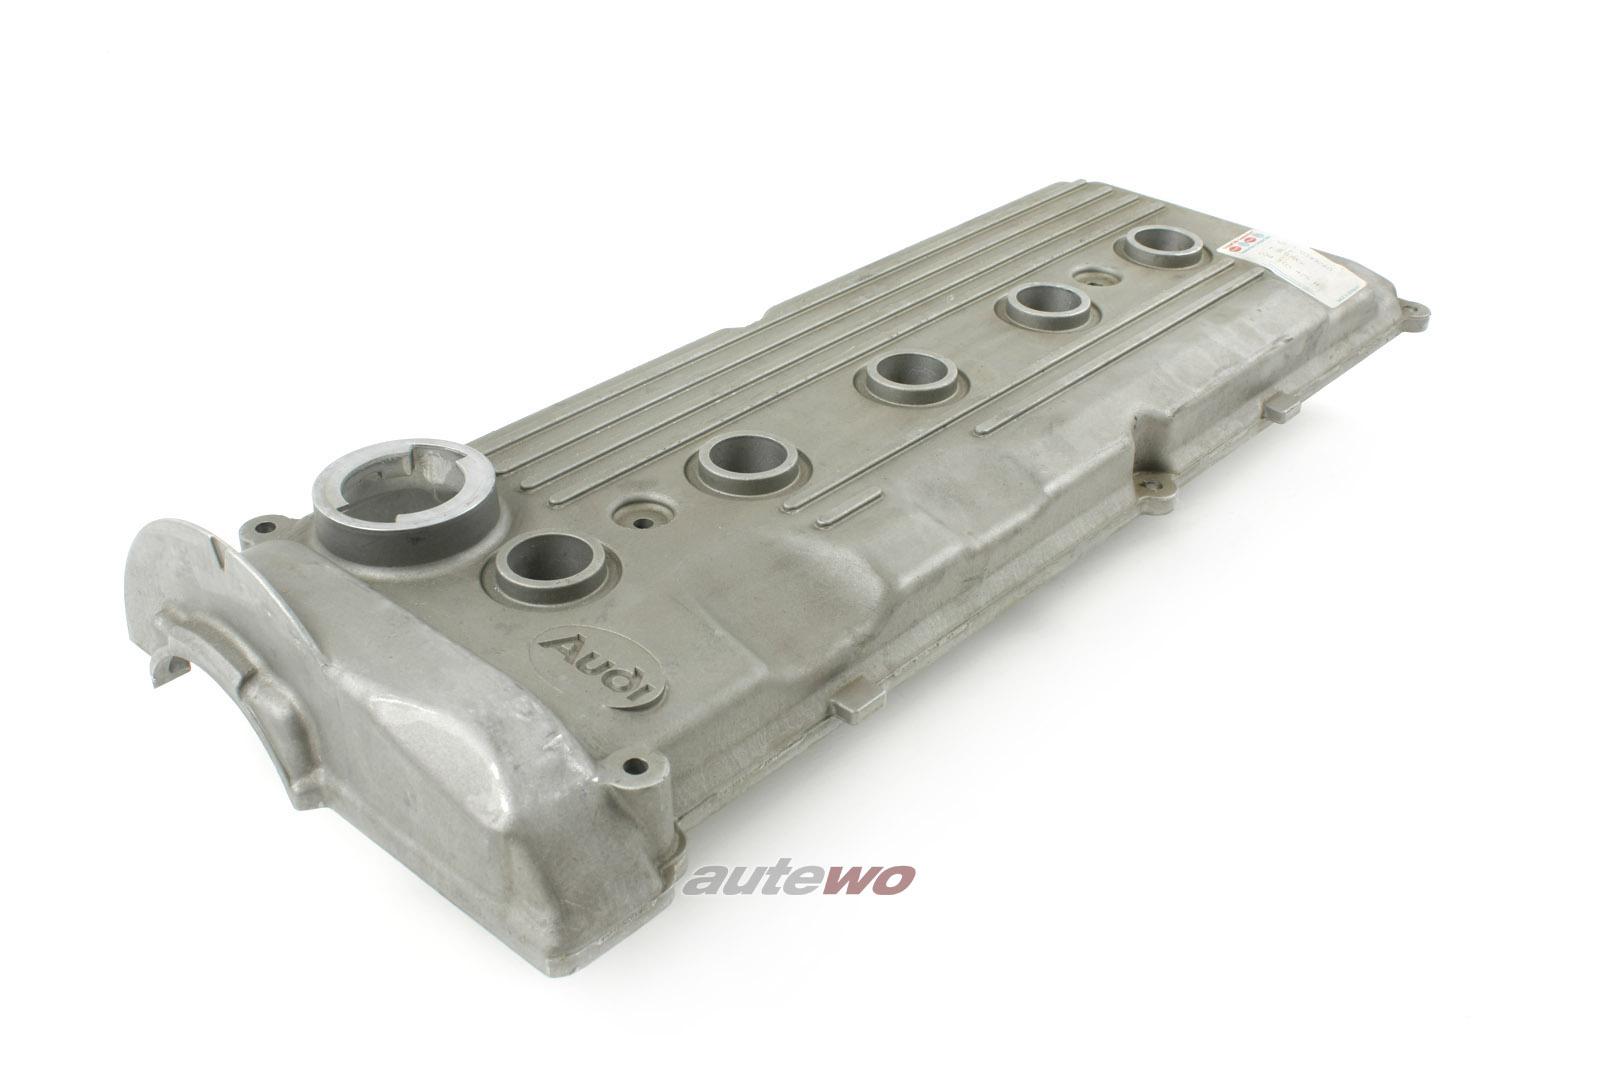 034103475H NEU Audi 90/Coupe Typ 89 2.0/2.2l 5 Zylinder 20V NM/7A Ventildeckel